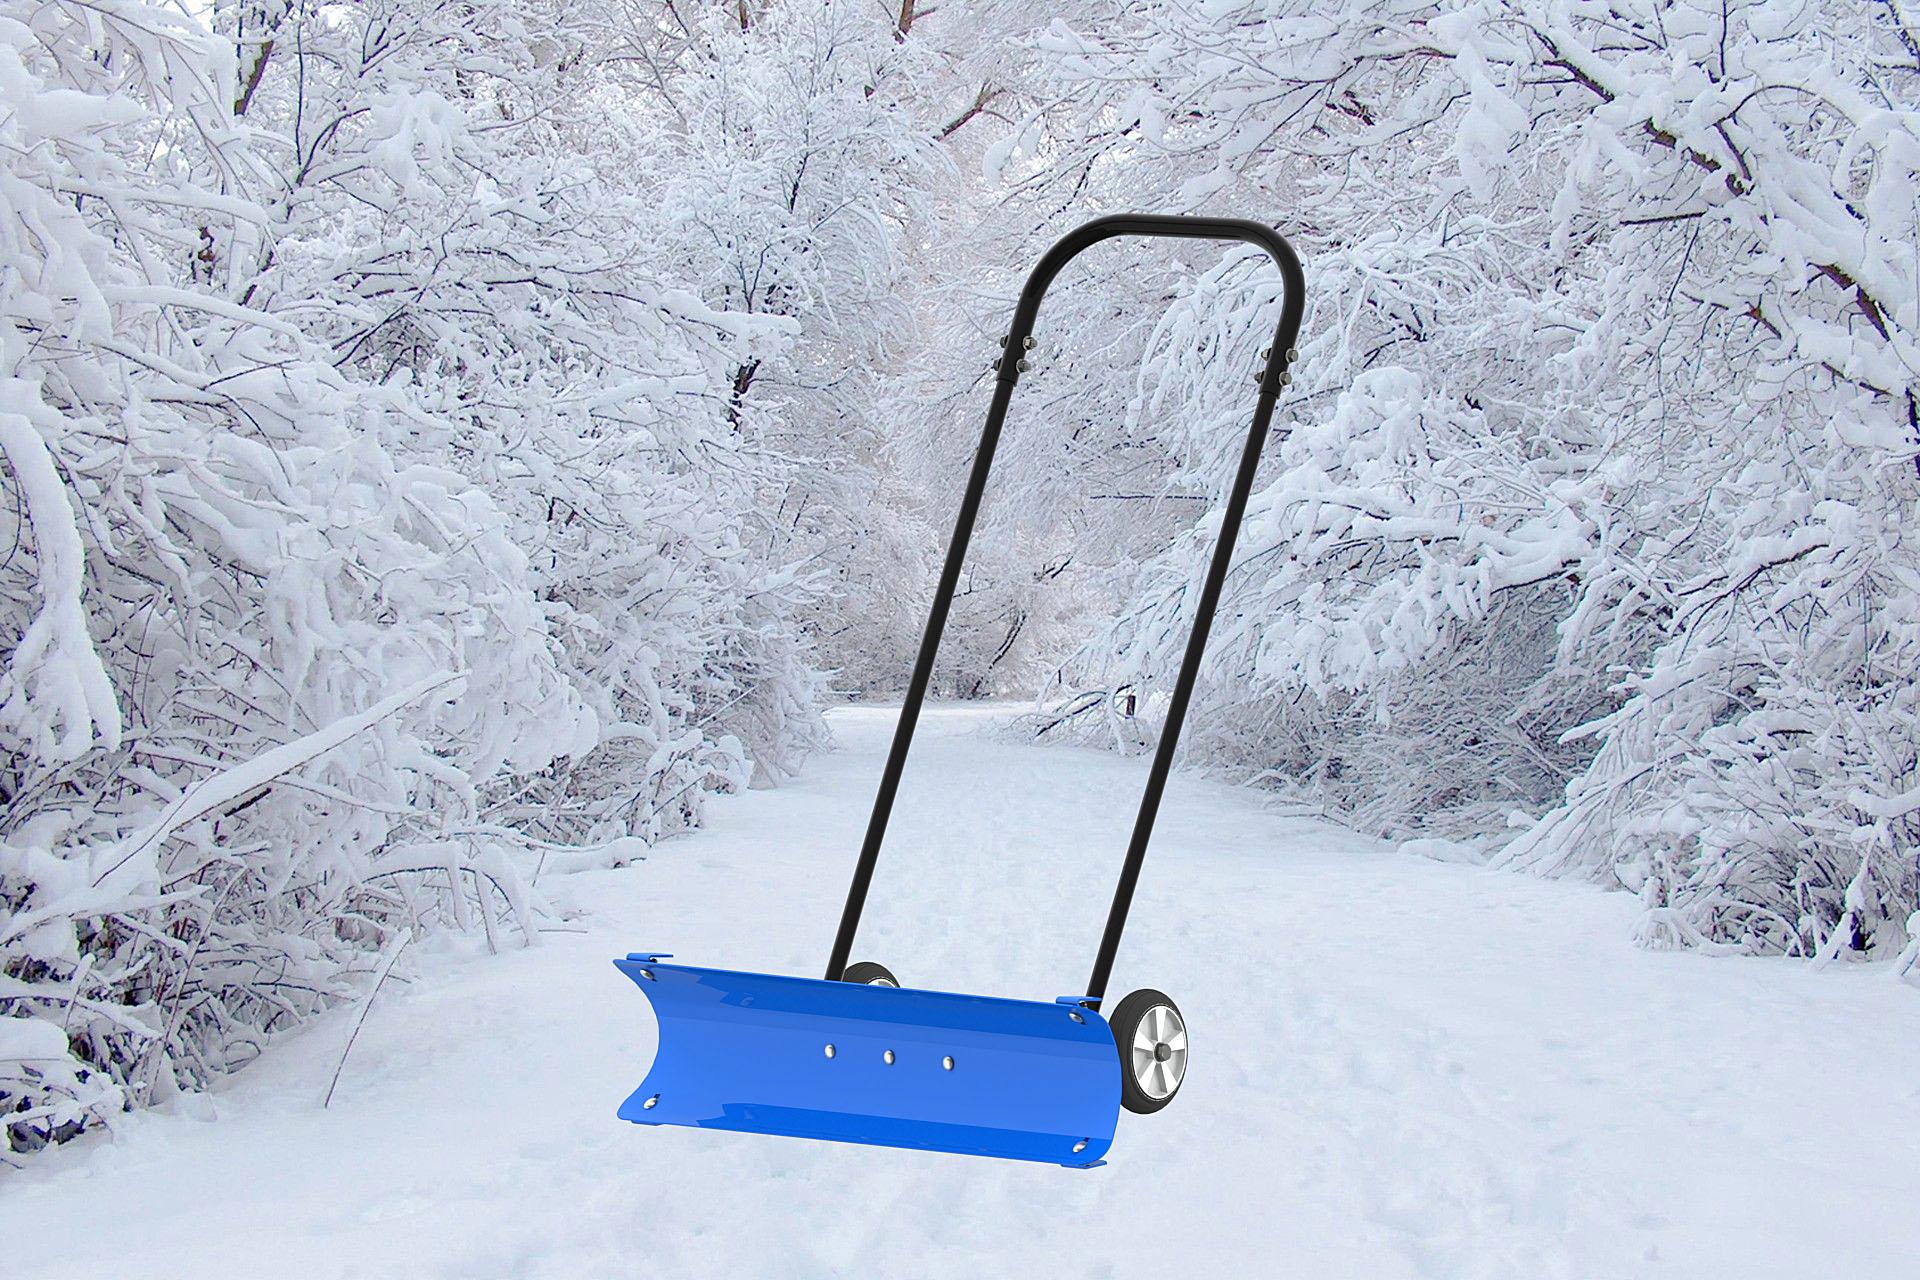 Лопата для уборки снега, скребки для быстрой чистки территории 18